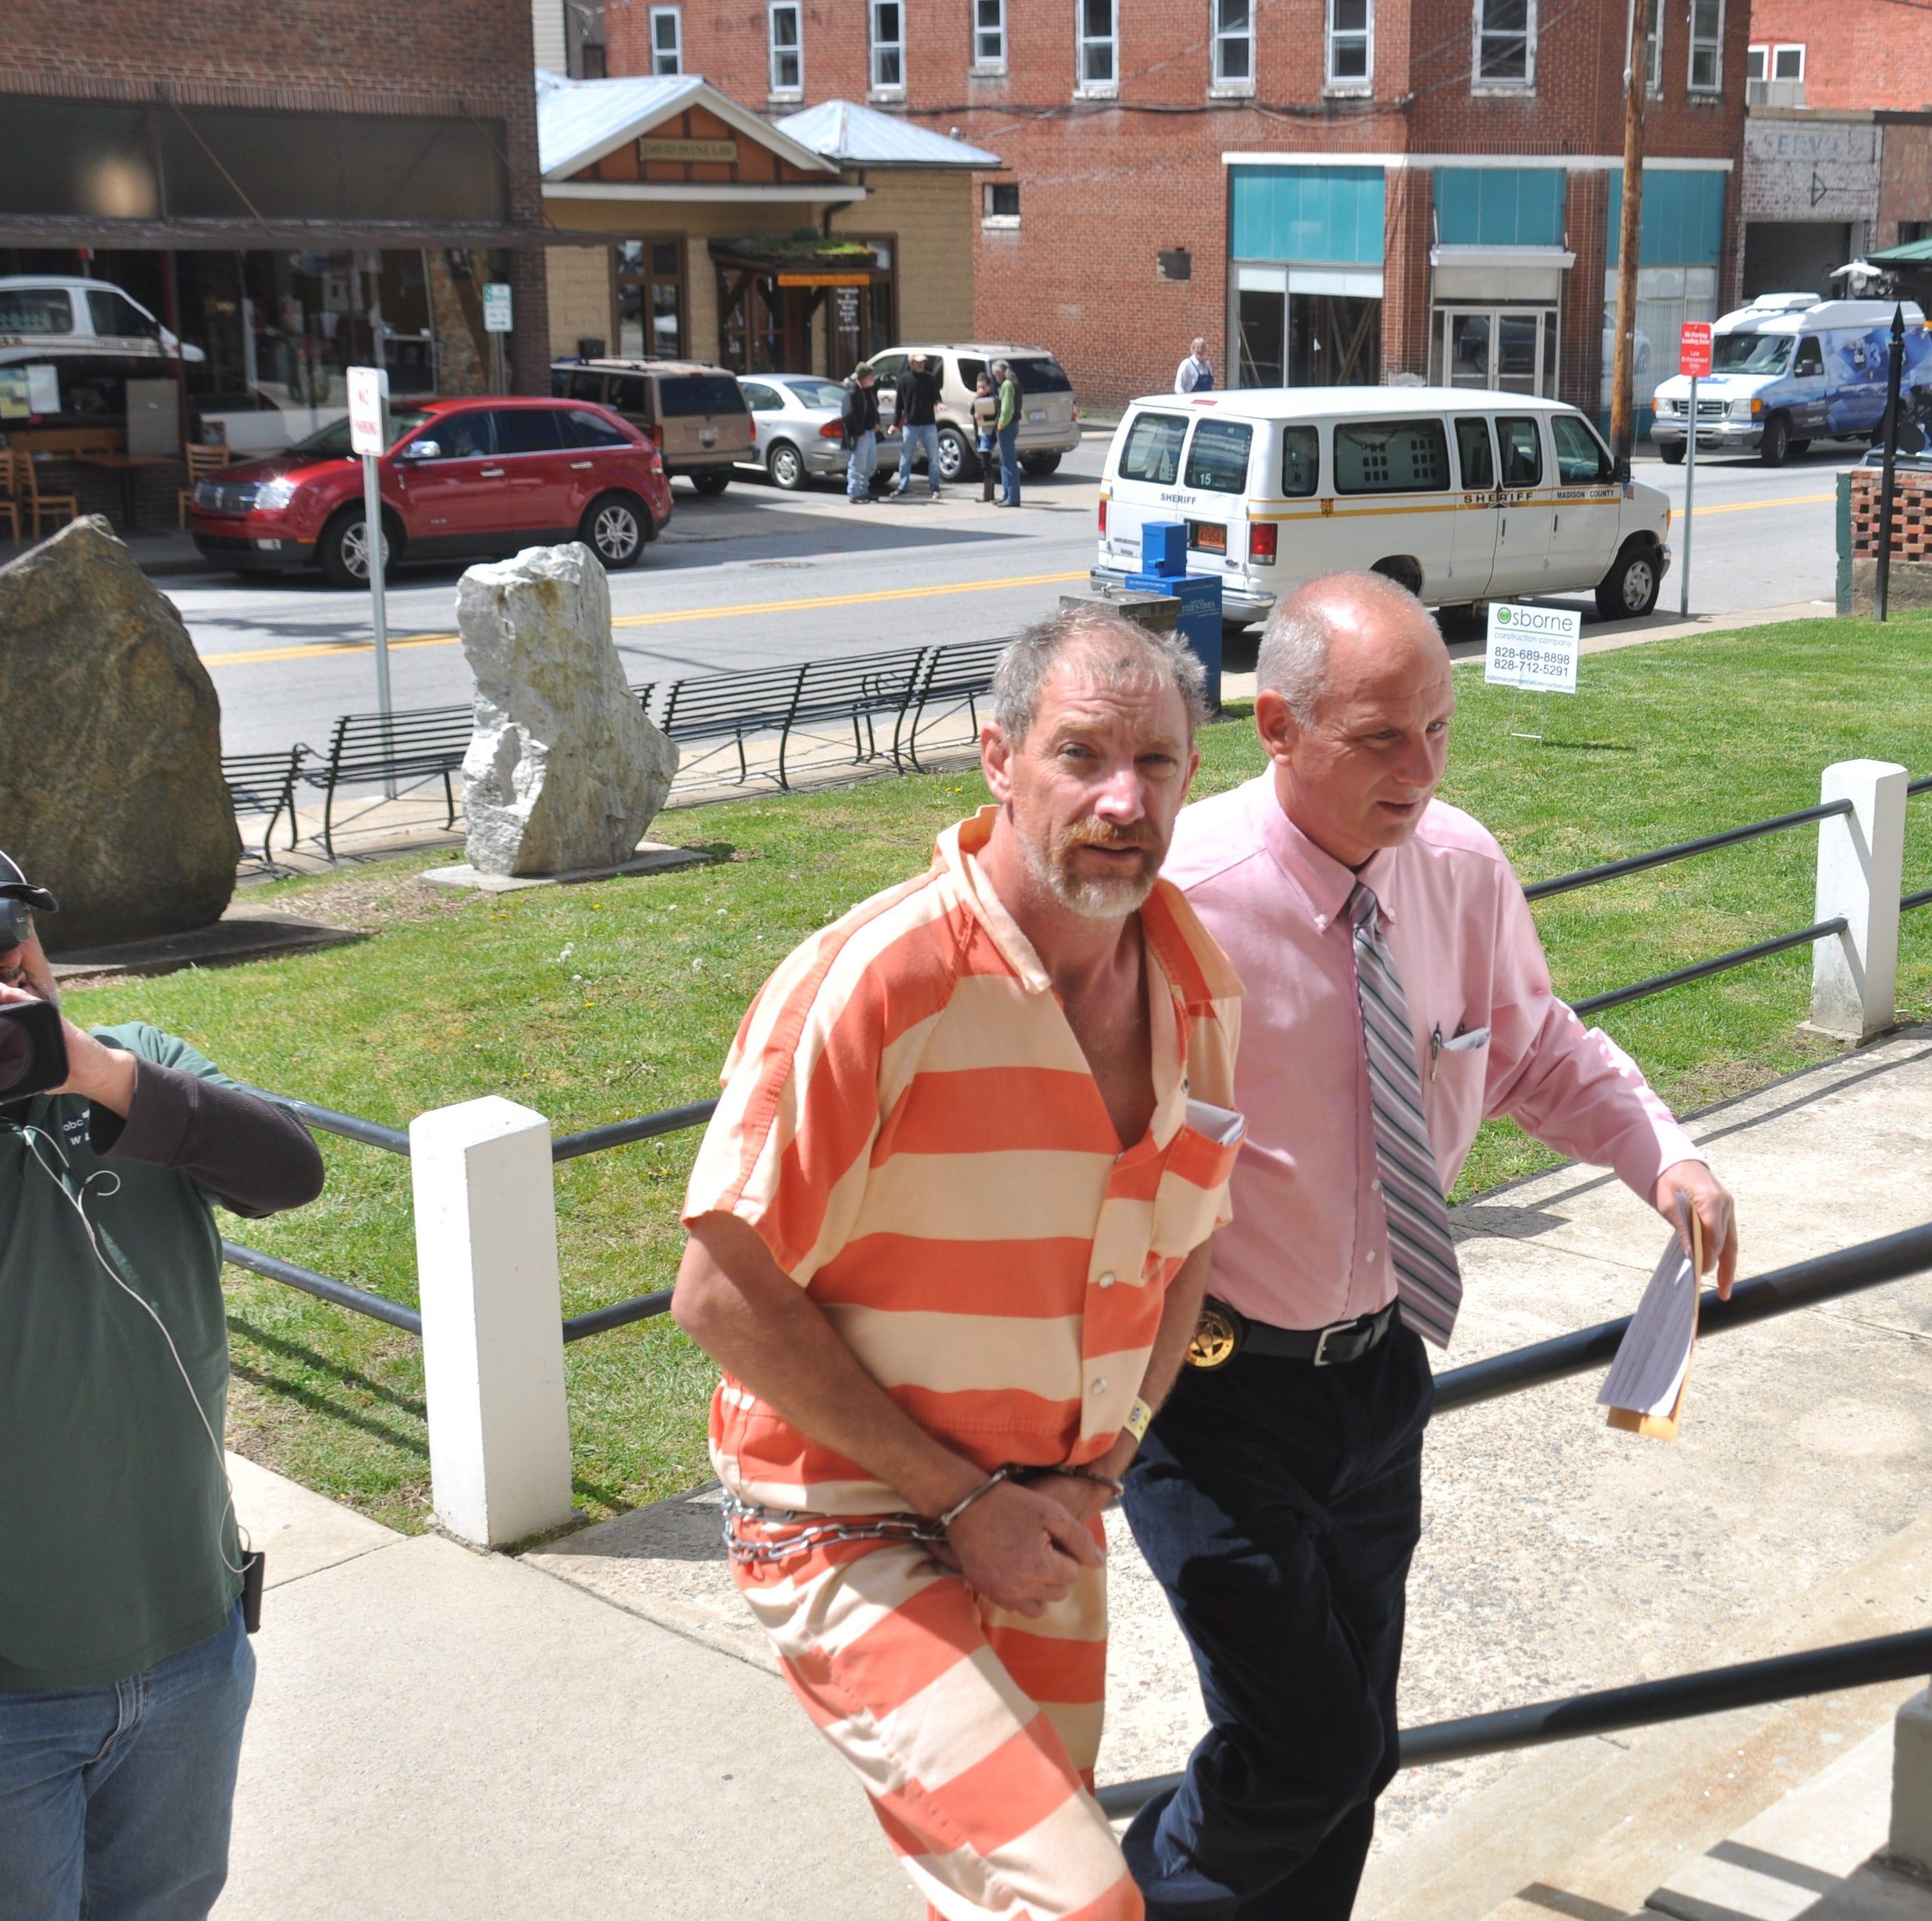 Shelton sentenced on 2016 murder charge